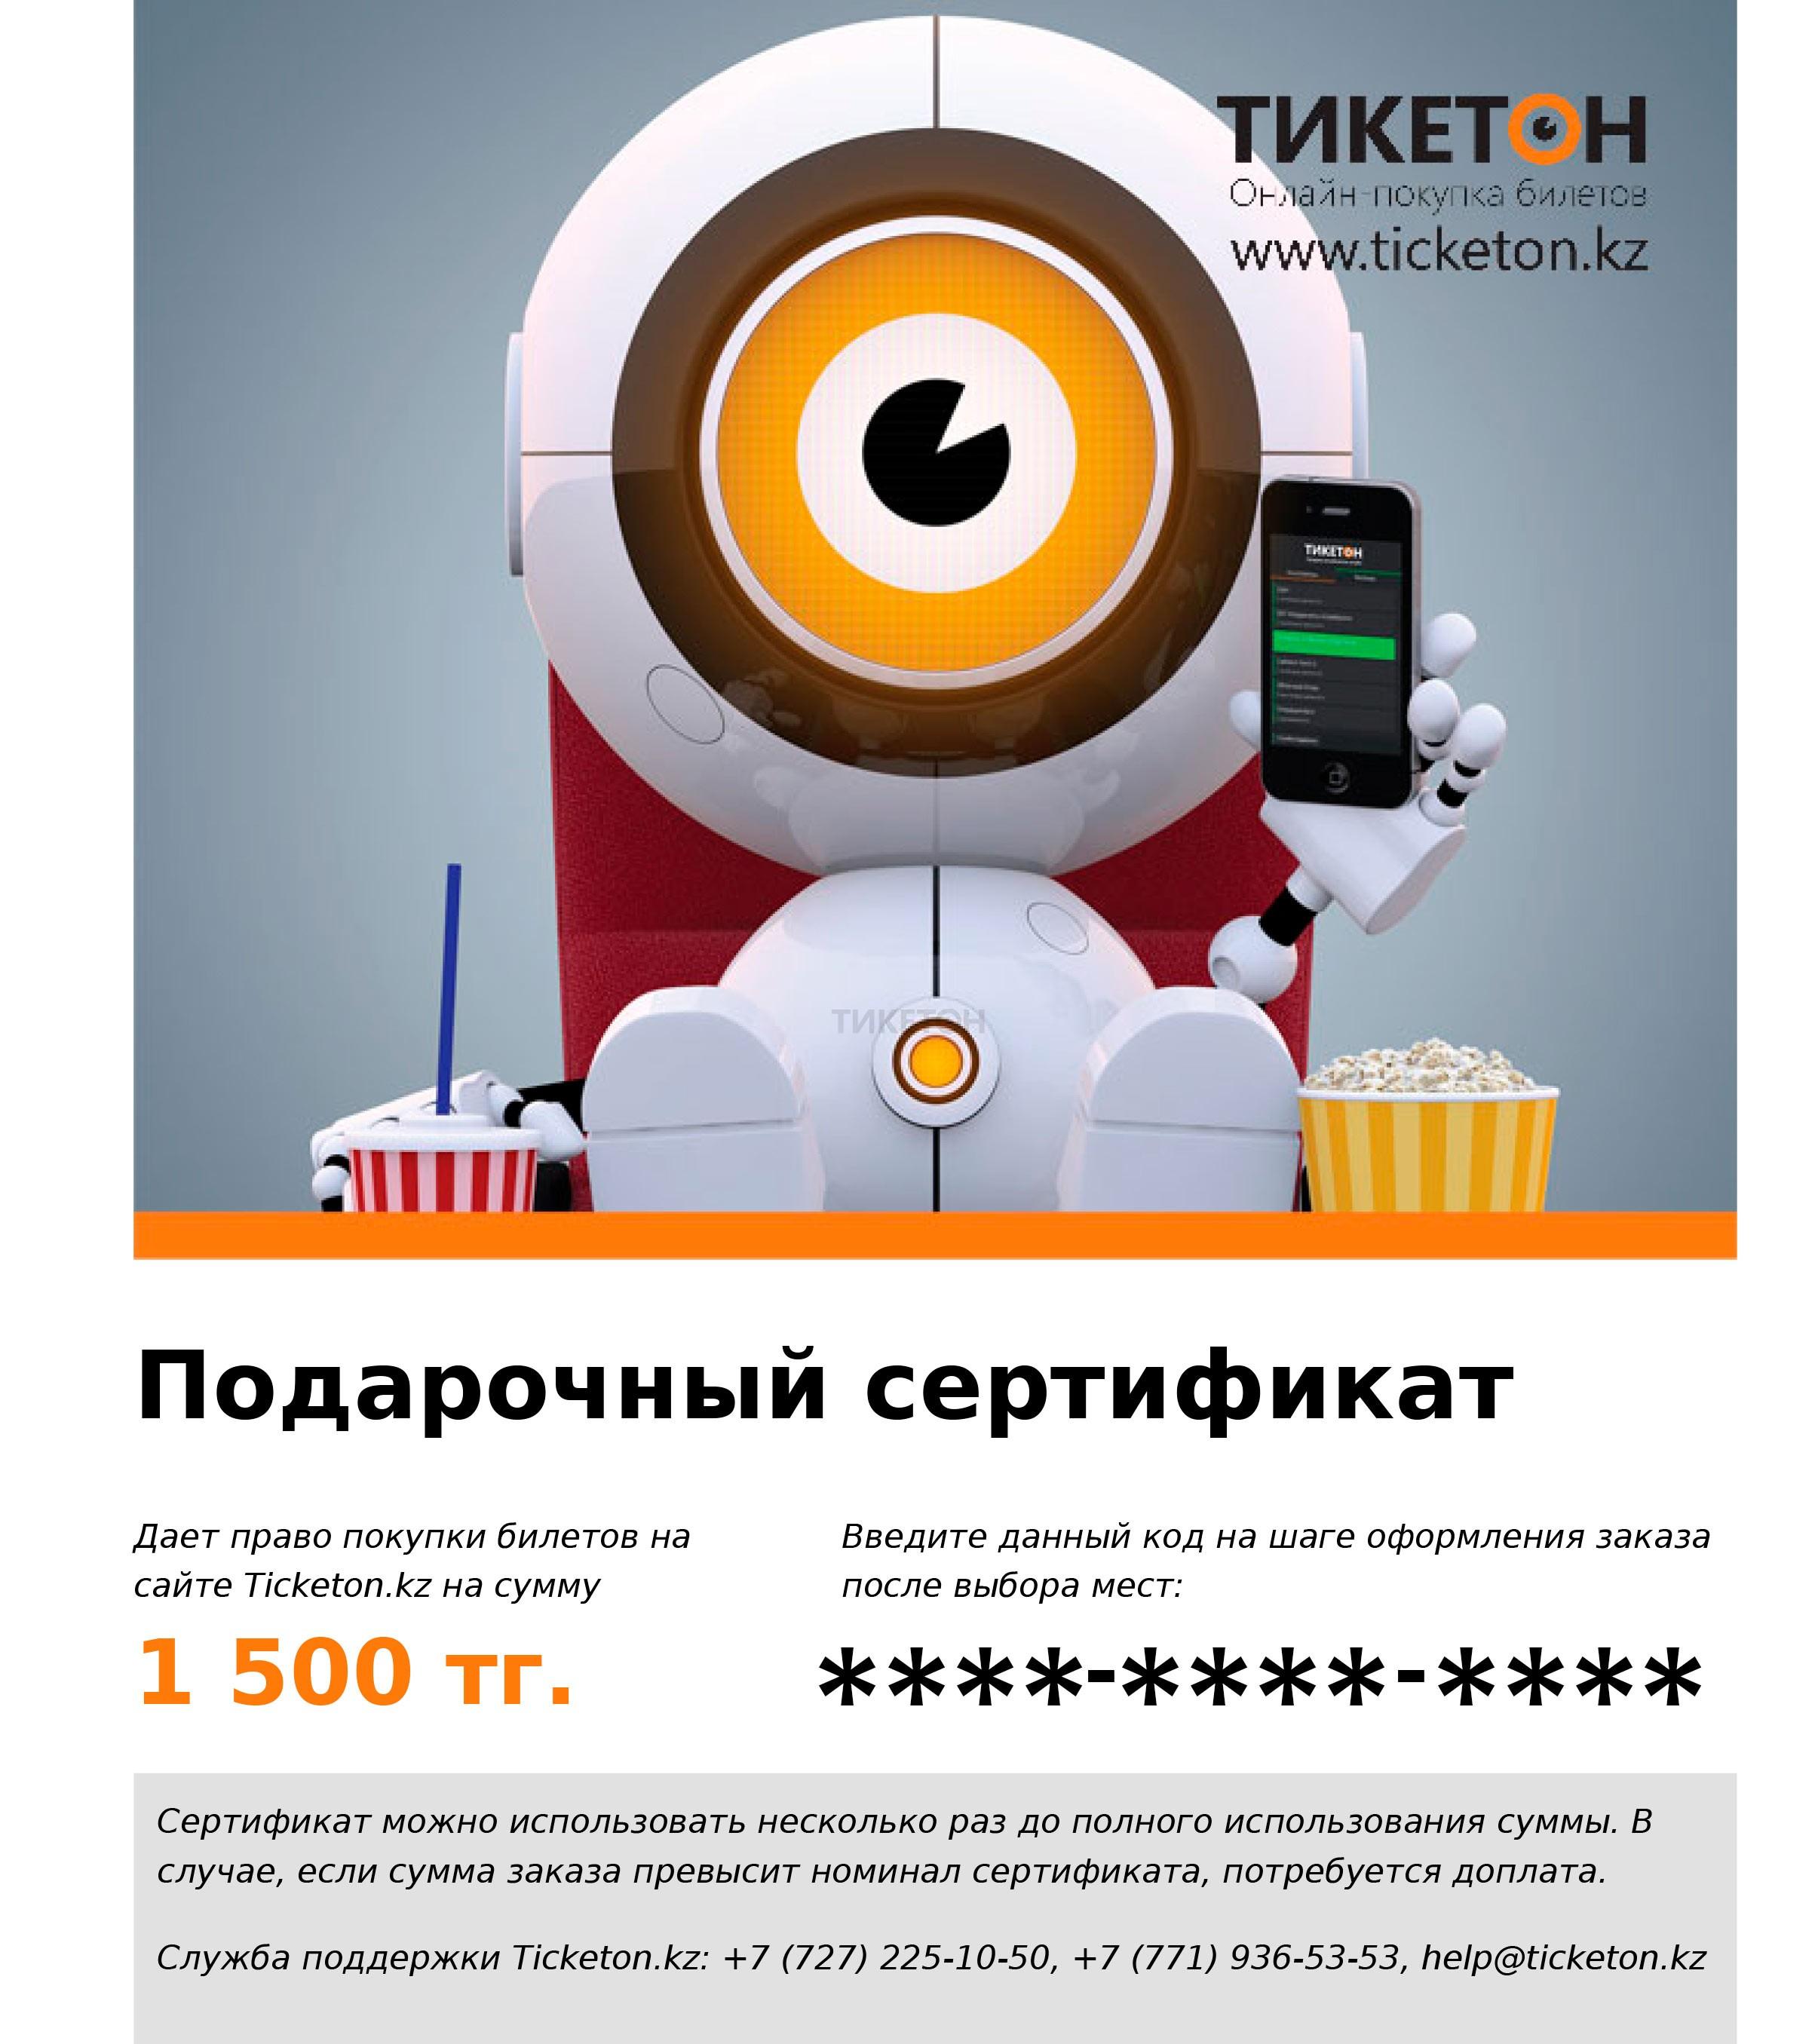 https://ticketon.kz/files/media/ticketon-sertificate20.jpg